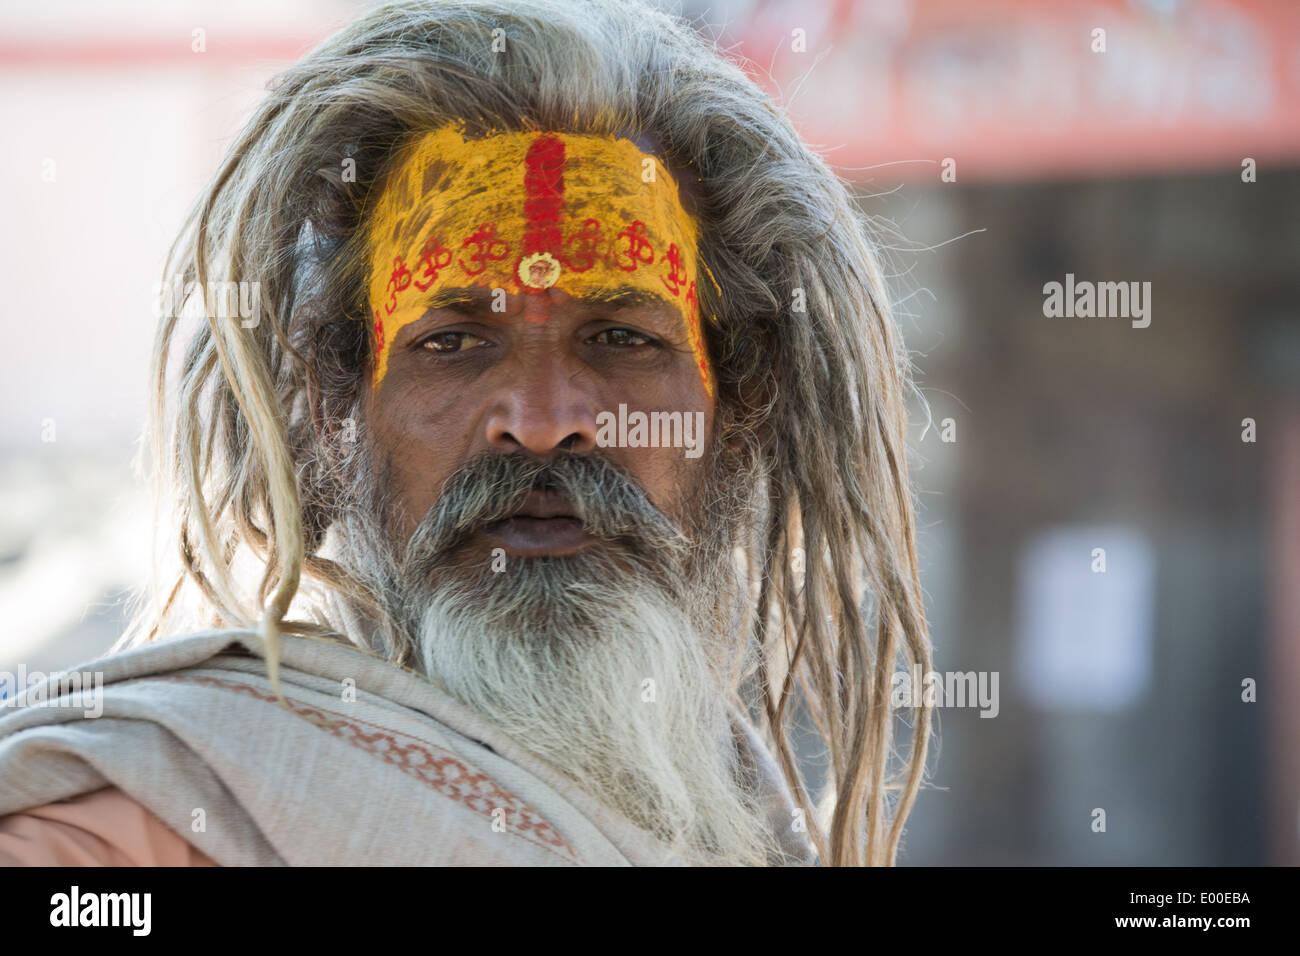 India. Sadhu (Holy man) in Ujjain, Madhya Pradesh. - Stock Image